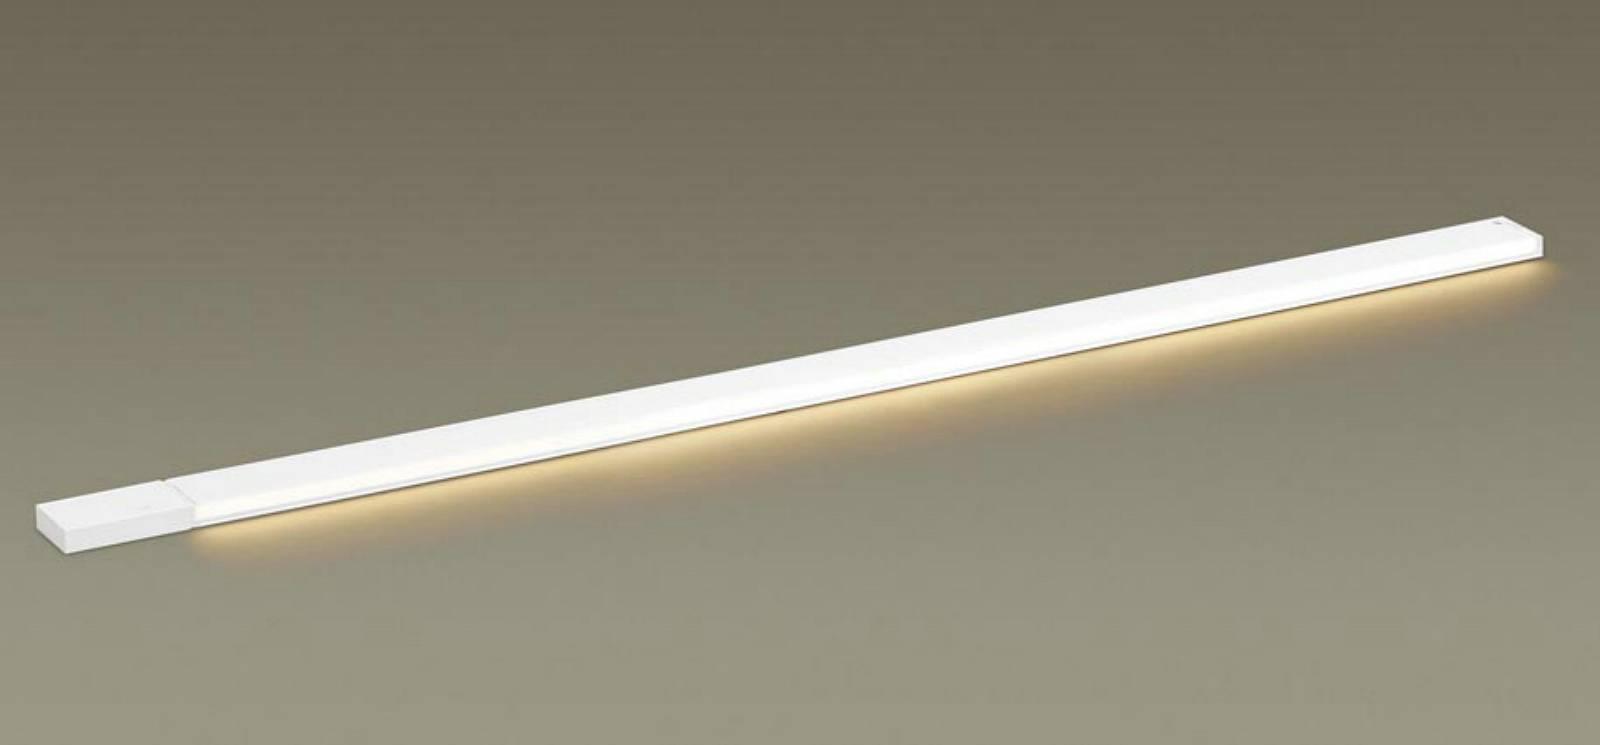 T区分 パナソニック LGB50935LE1 ベースライト 建築化照明器具 畳数設定無し LED【setsuden_led】